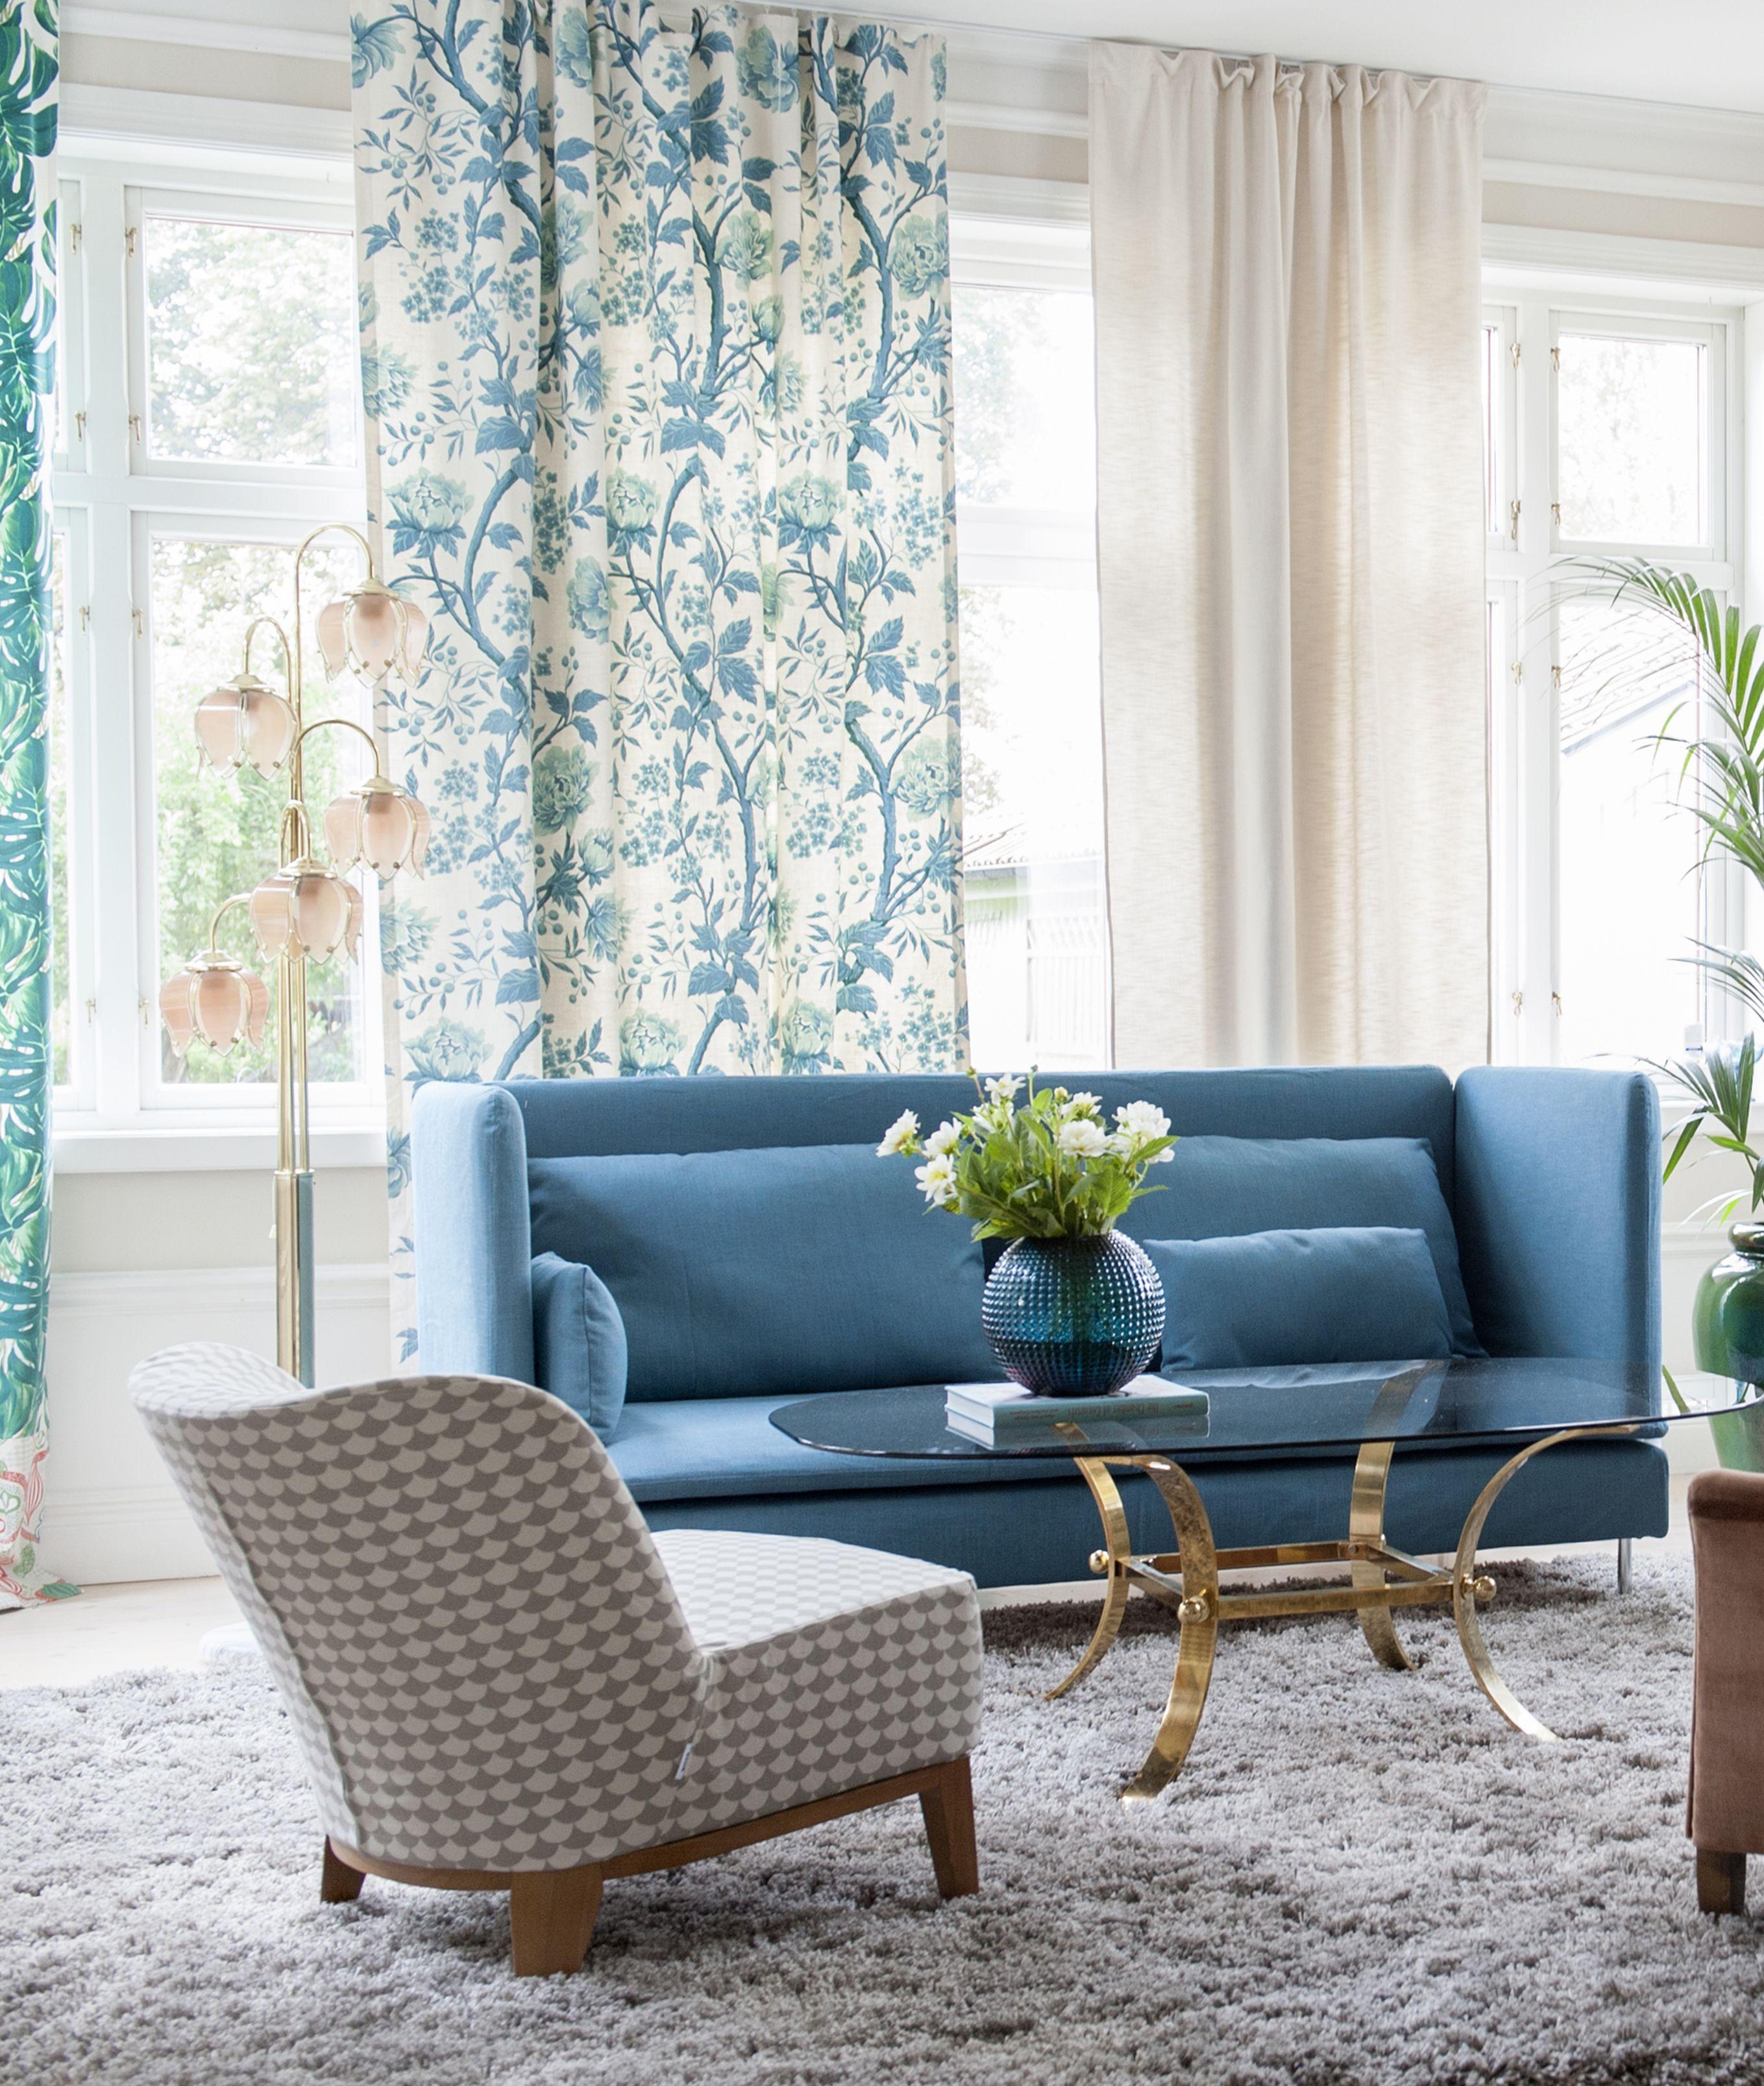 Söderhamn 3 Seater sofa cover Loose Fit Urban